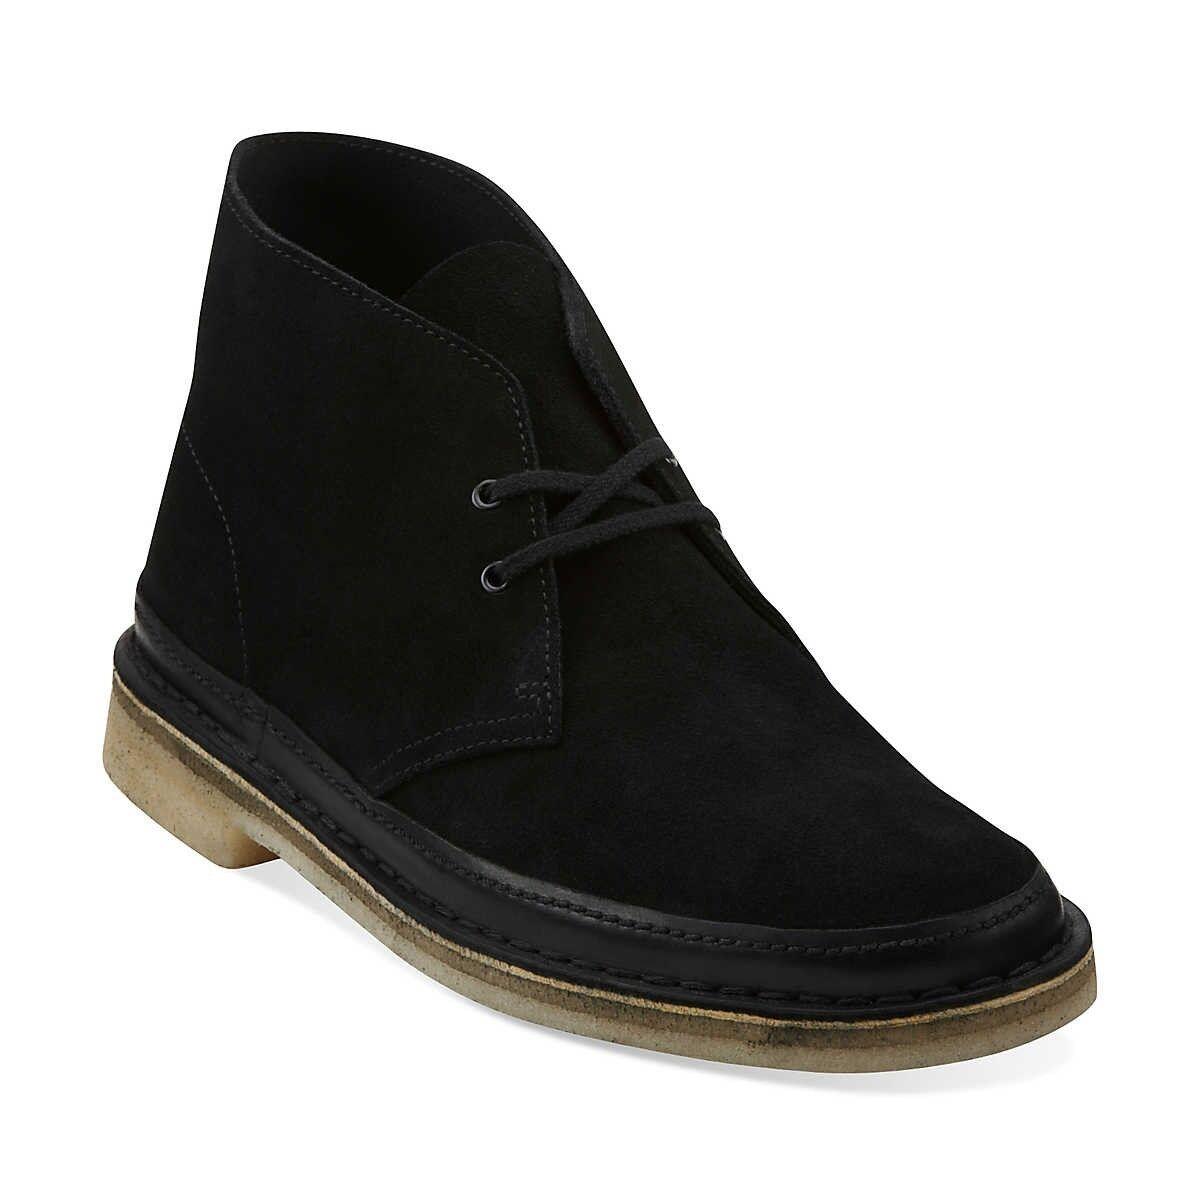 Clarks Originals Desert Guard Black Suede Men's Shoes 62131